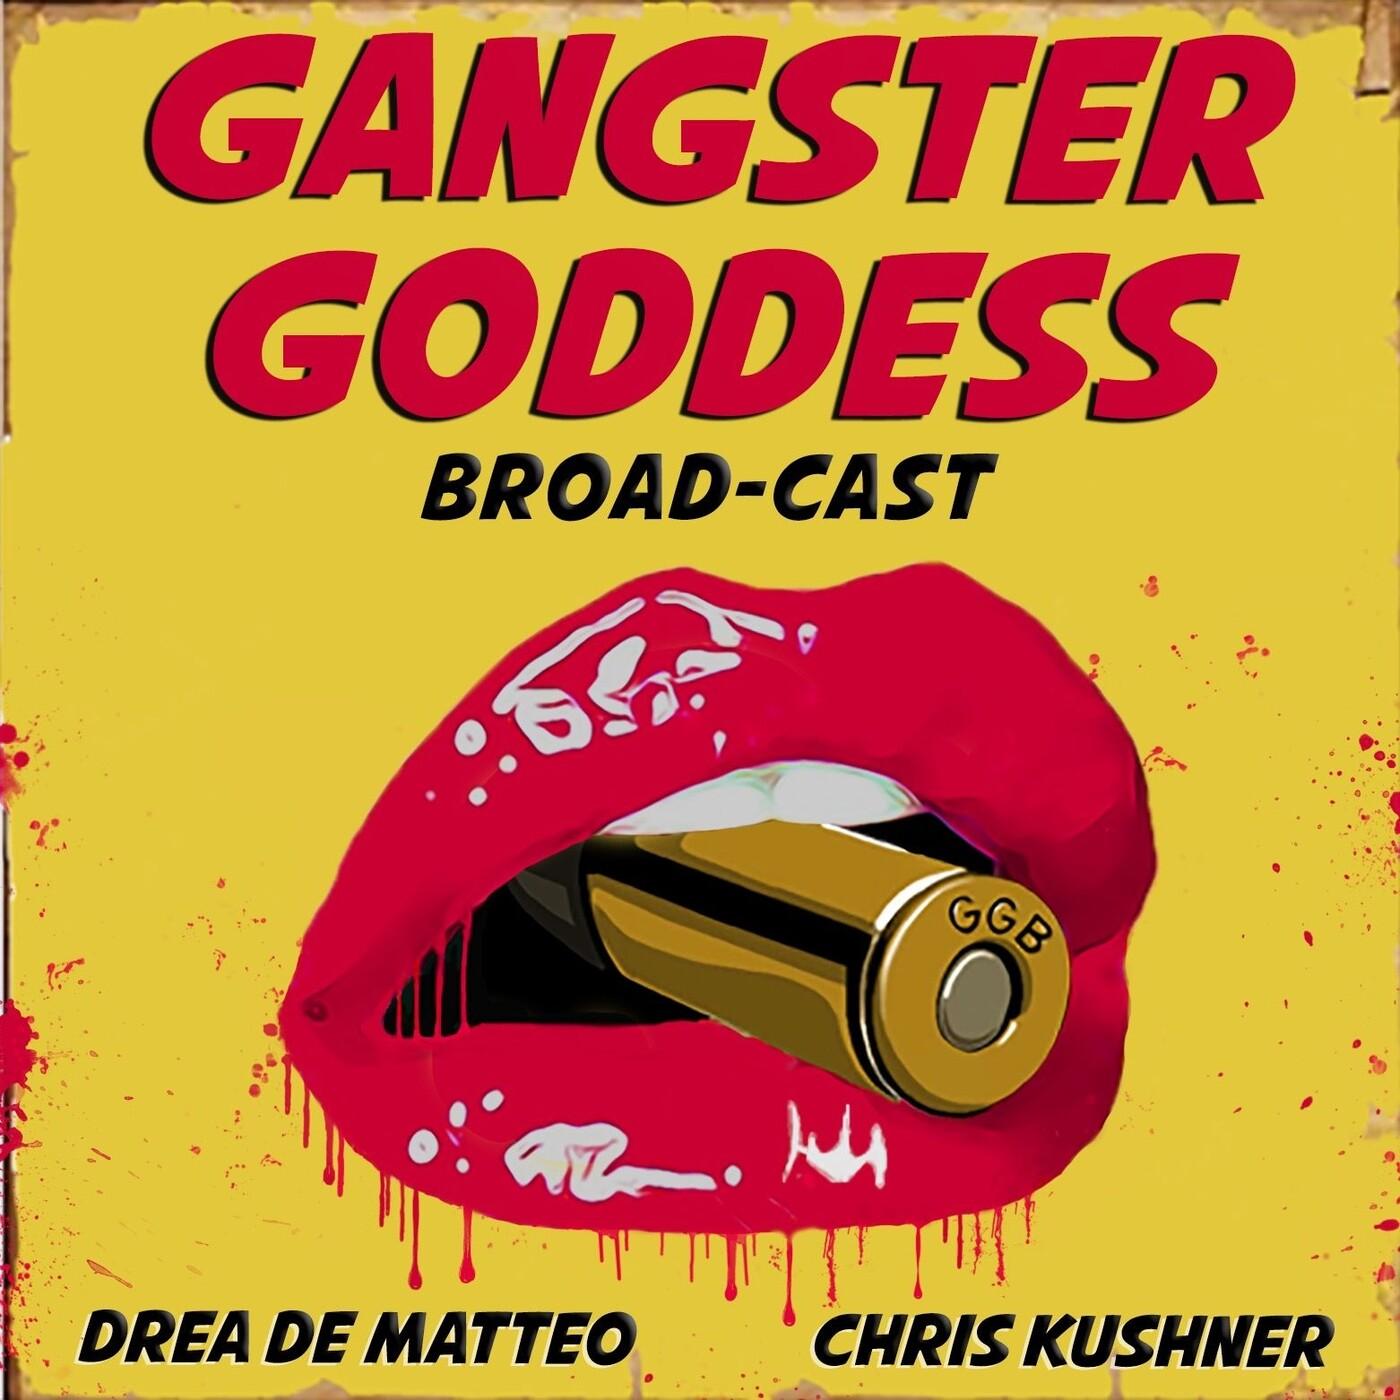 Gangster Goddess Broad-cast: The Allen Coulter interview